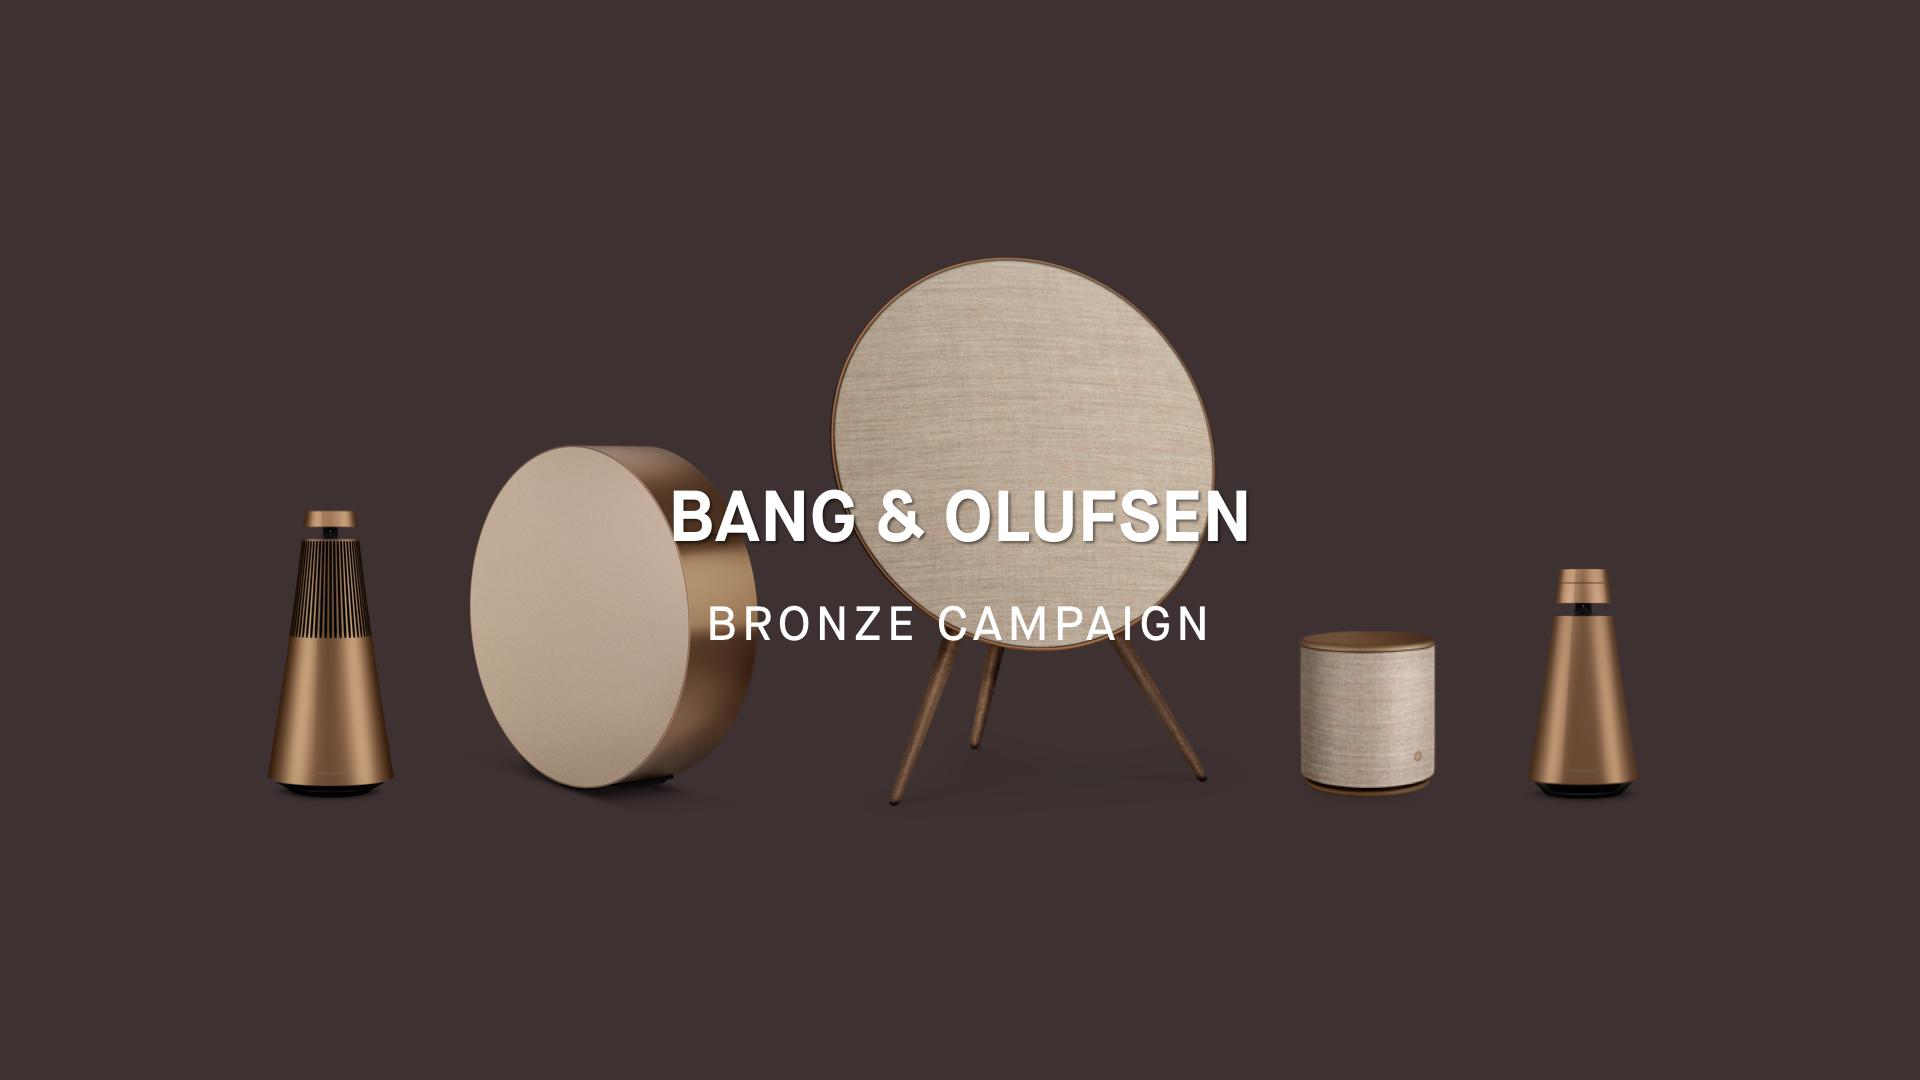 LDN_Bang+Olufsen_Creds Deck.000.jpeg